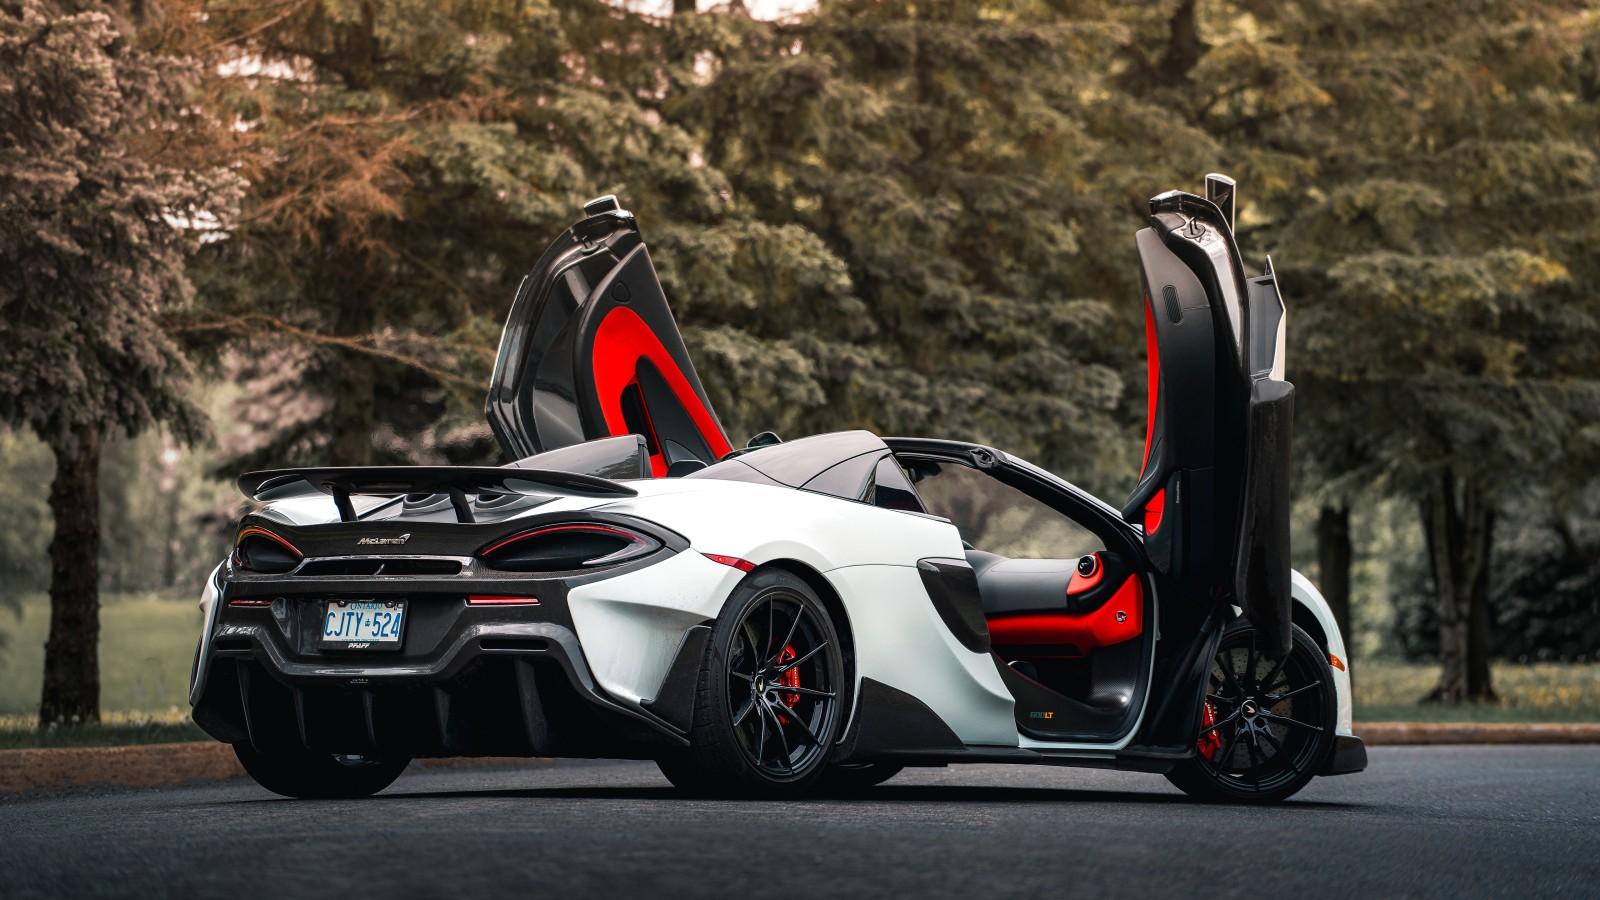 2020 McLaren 600LT Spider 4K 2 Wallpaper | HD Car ...